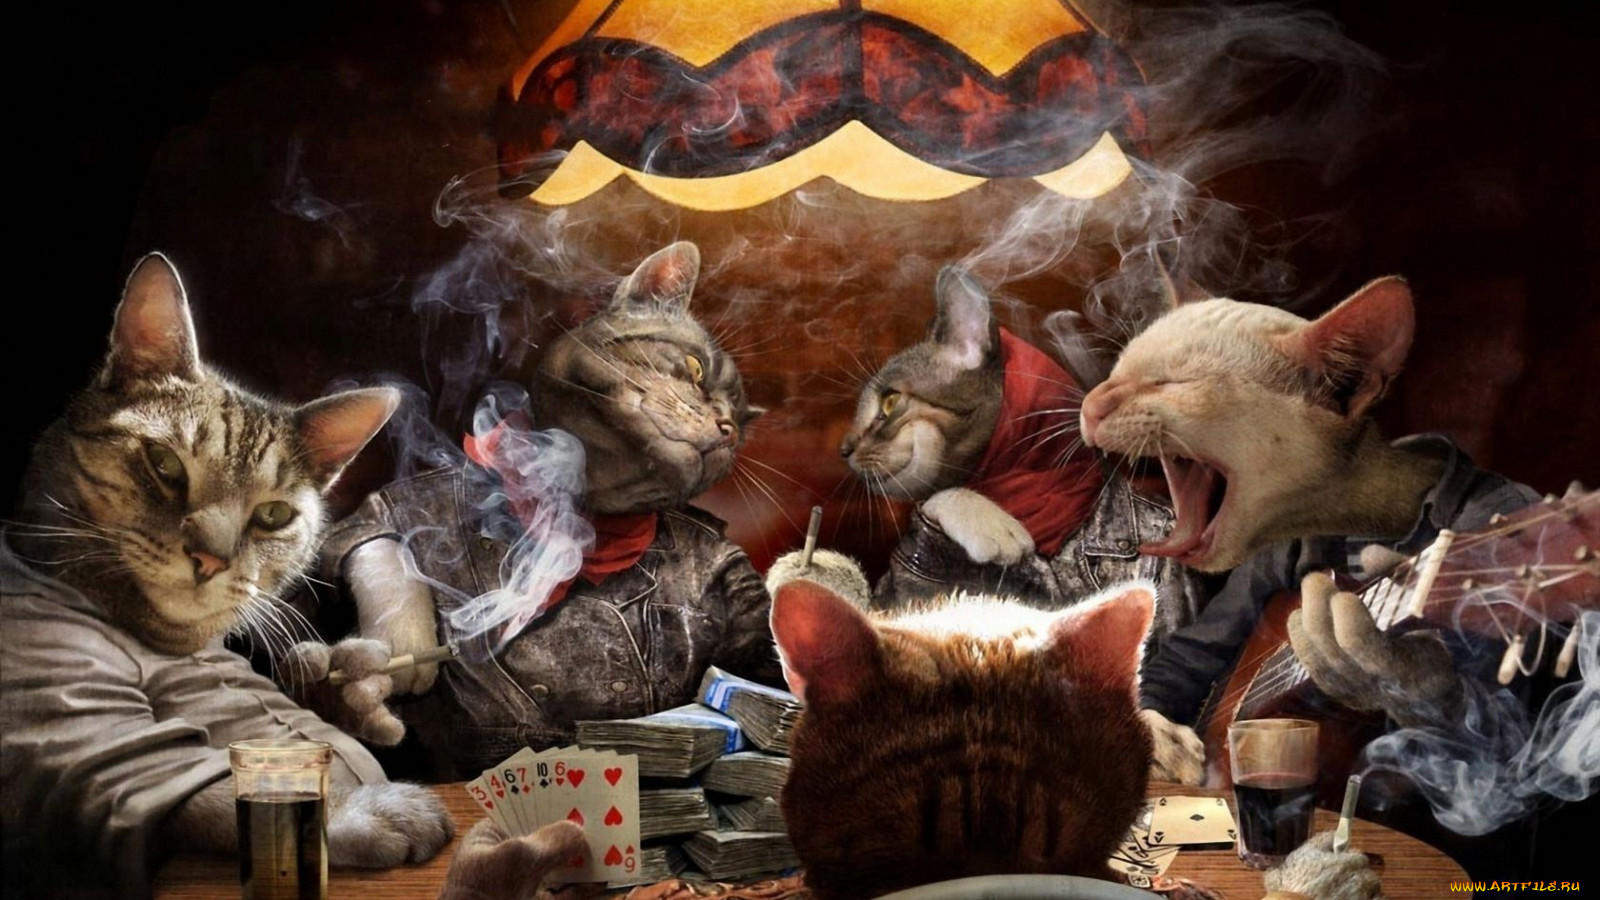 Юмор приколы карты коты игра деньги